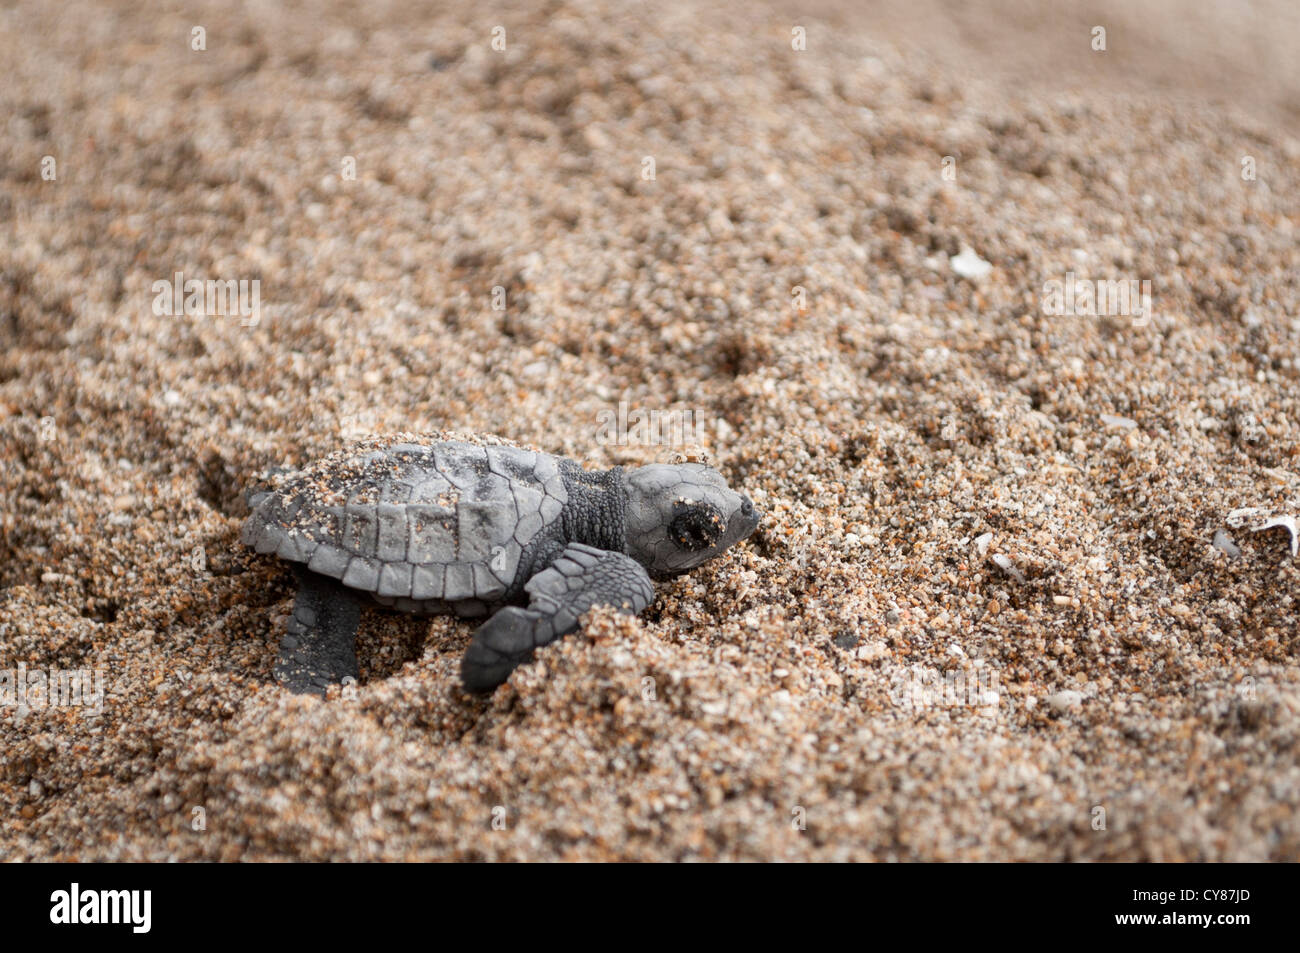 Olive Ridley sea turtle (Lepidochelys olivacea) hatchling - Stock Image